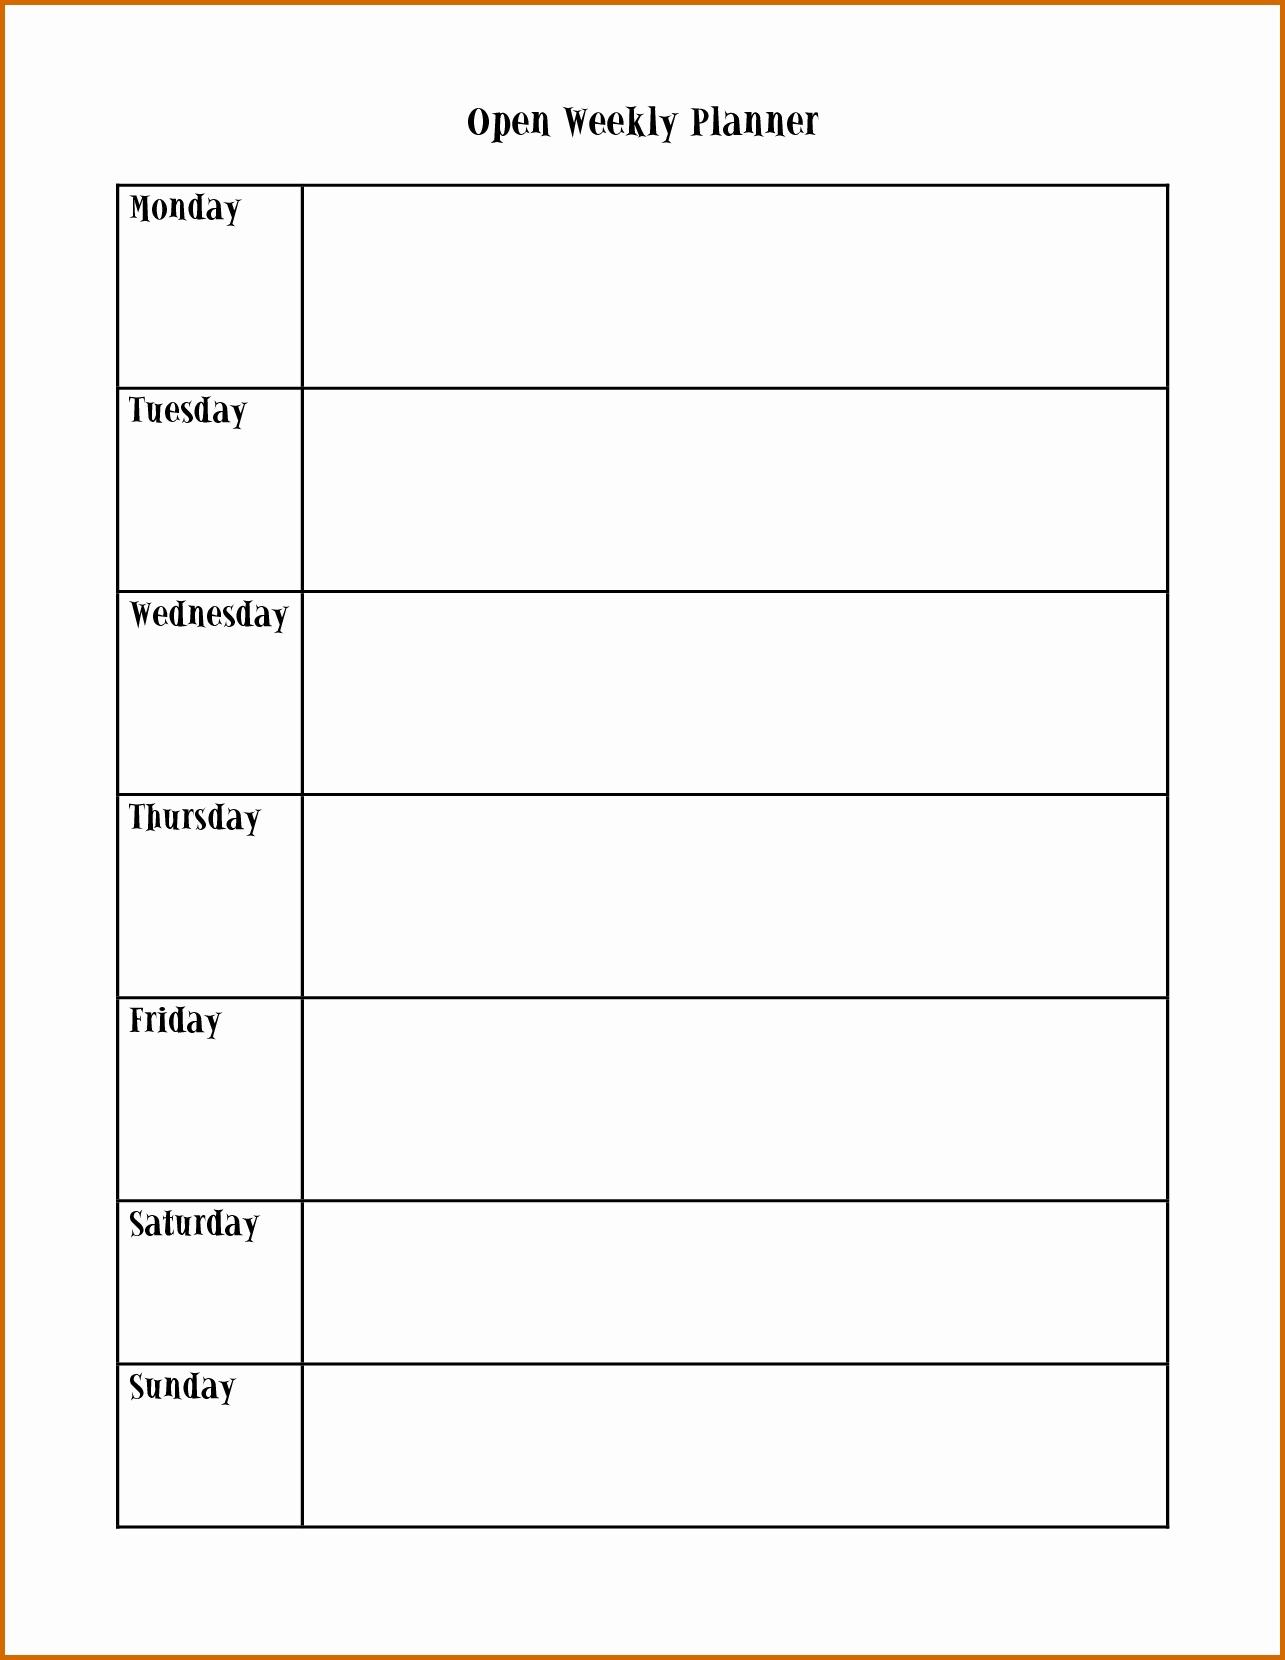 Schedule Plate Monday Through Friday Weekly Calendar Word | Smorad with regard to Monday Through Friday Calendar Template